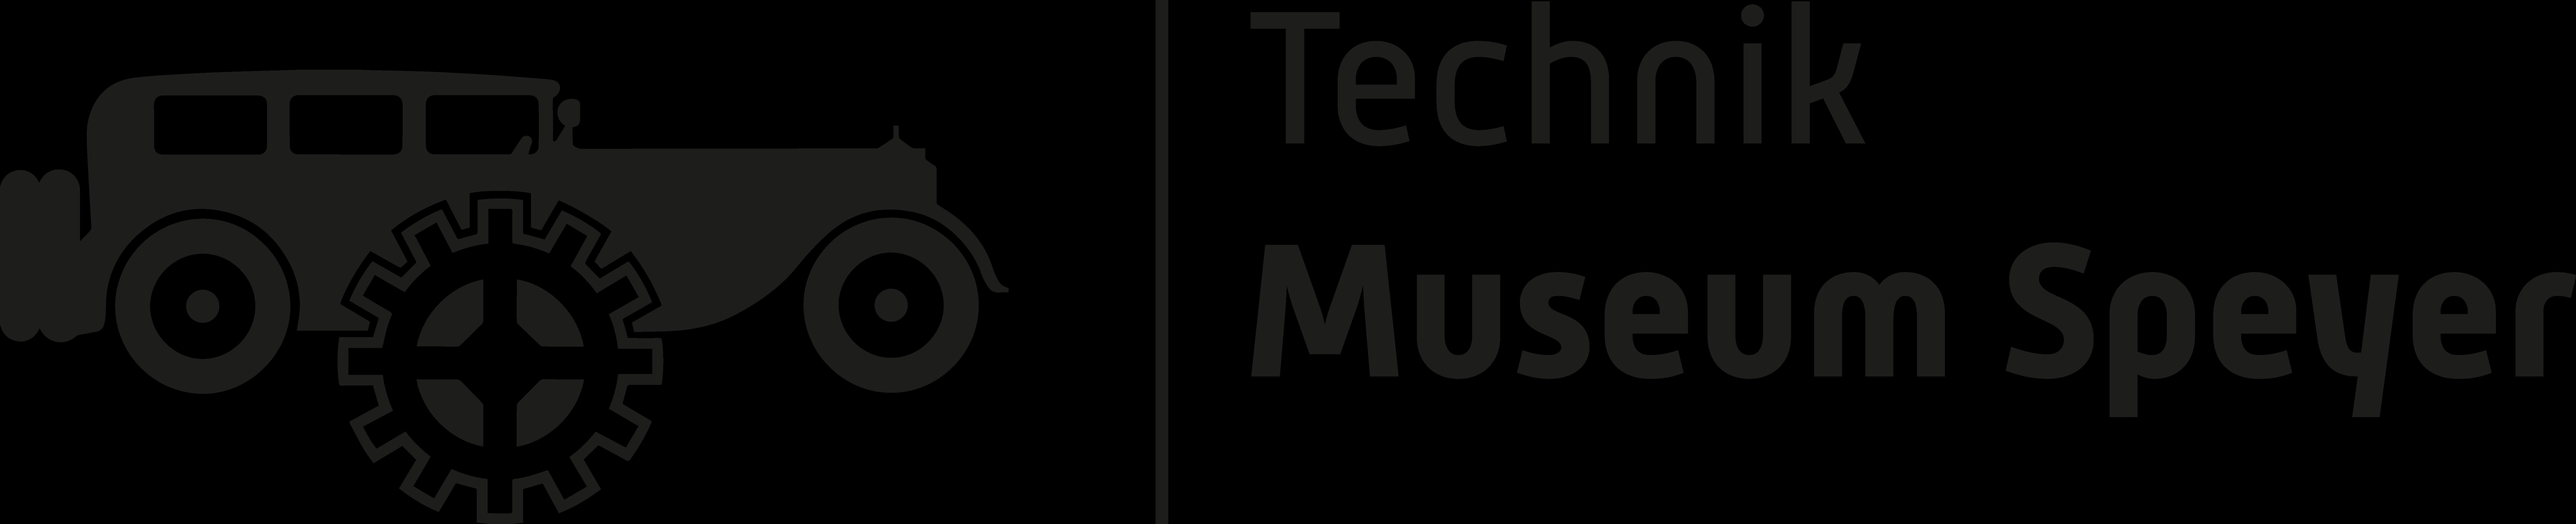 Technik Museum Speyer Musee De La Technique De Spire